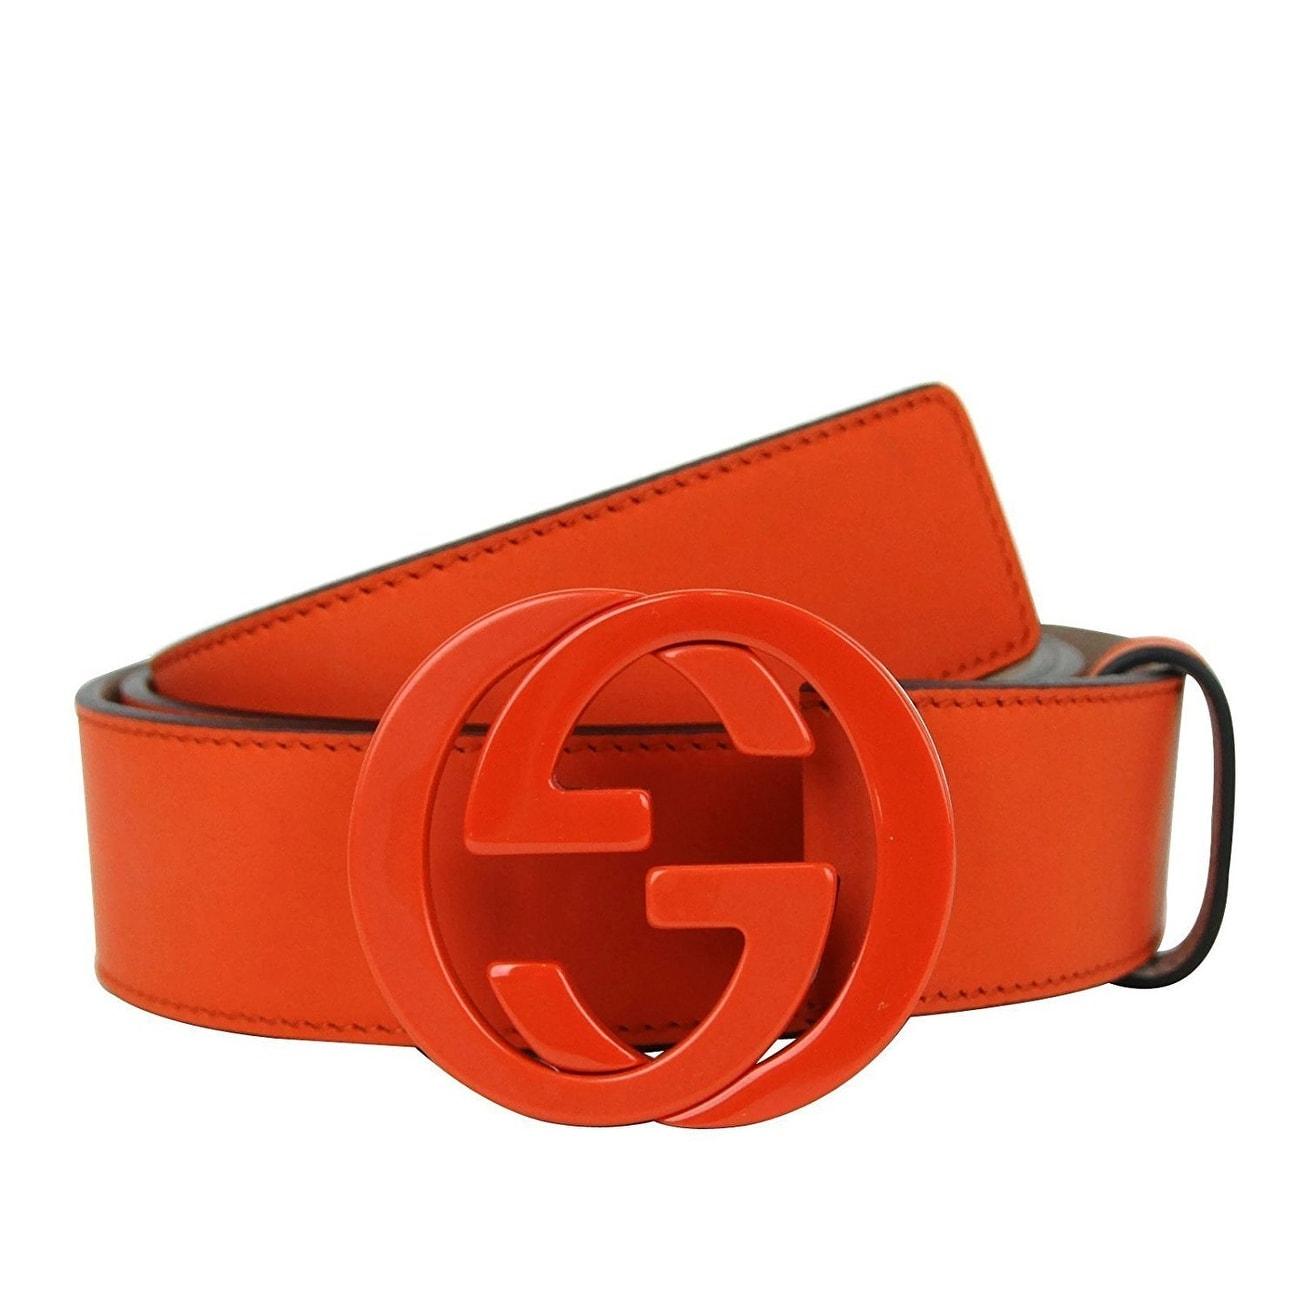 96bb80c4f0f Gucci Men s Orange Leather Interlocking G Buckle Belt 223891 7519 (110    44) - 110   44